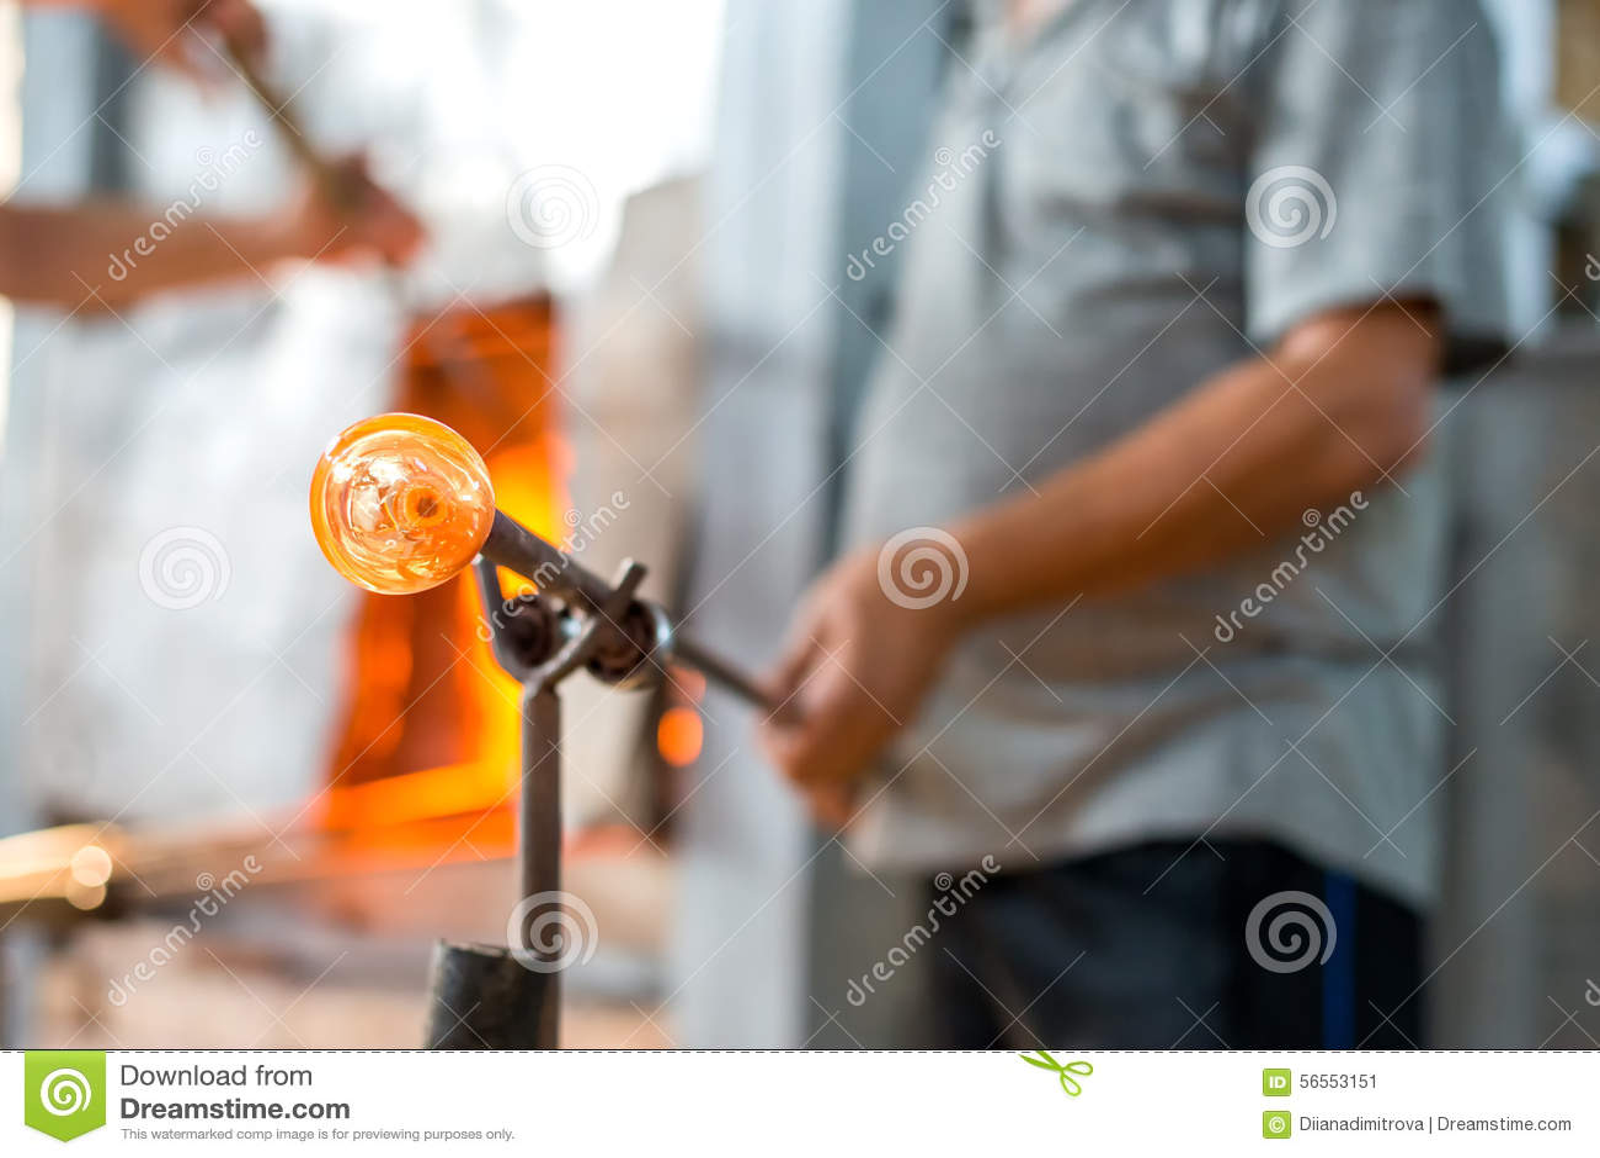 Download Χειροποίητοι αριθμοί του λειωμένου γυαλιού Στοκ Εικόνα - εικόνα από κατασκευή, χρώματα: 56553151